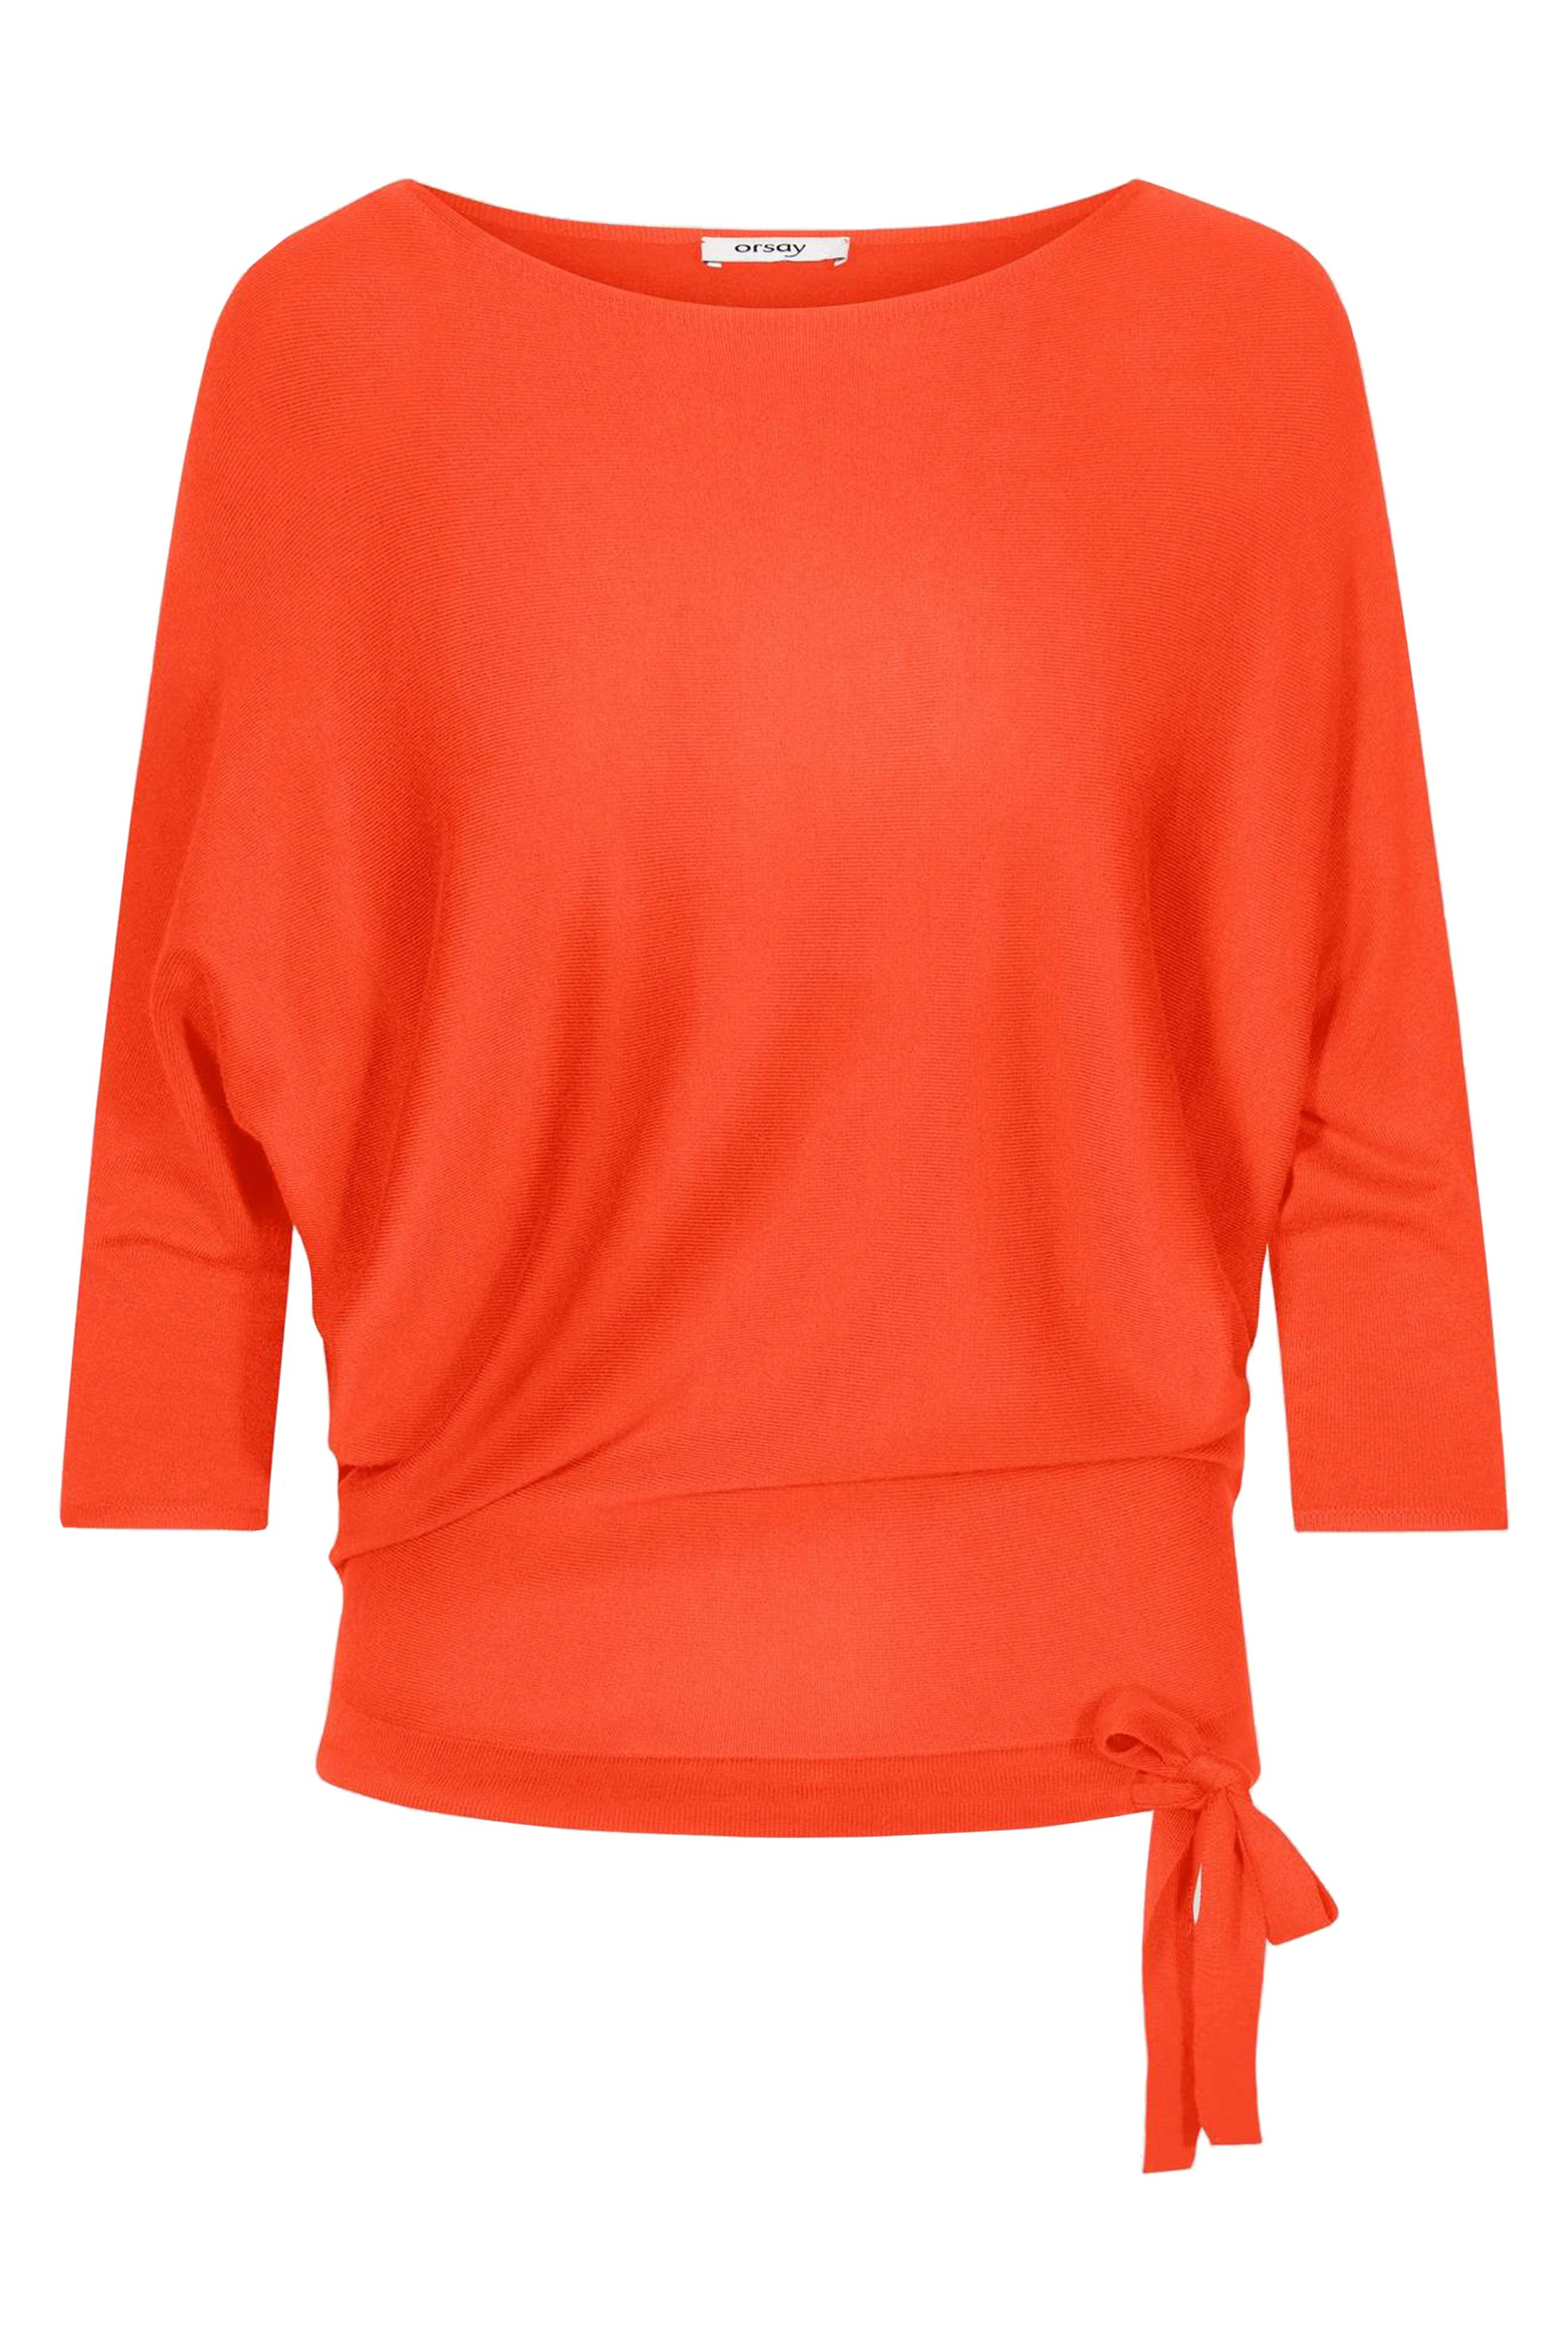 Orsay γυναικεία μονόχρωμη πλεκτή μπλούζα με μανίκια ρεγκλάν - 501899-351000 - Πο γυναικα   ρουχα   πλεκτά   πουλόβερ